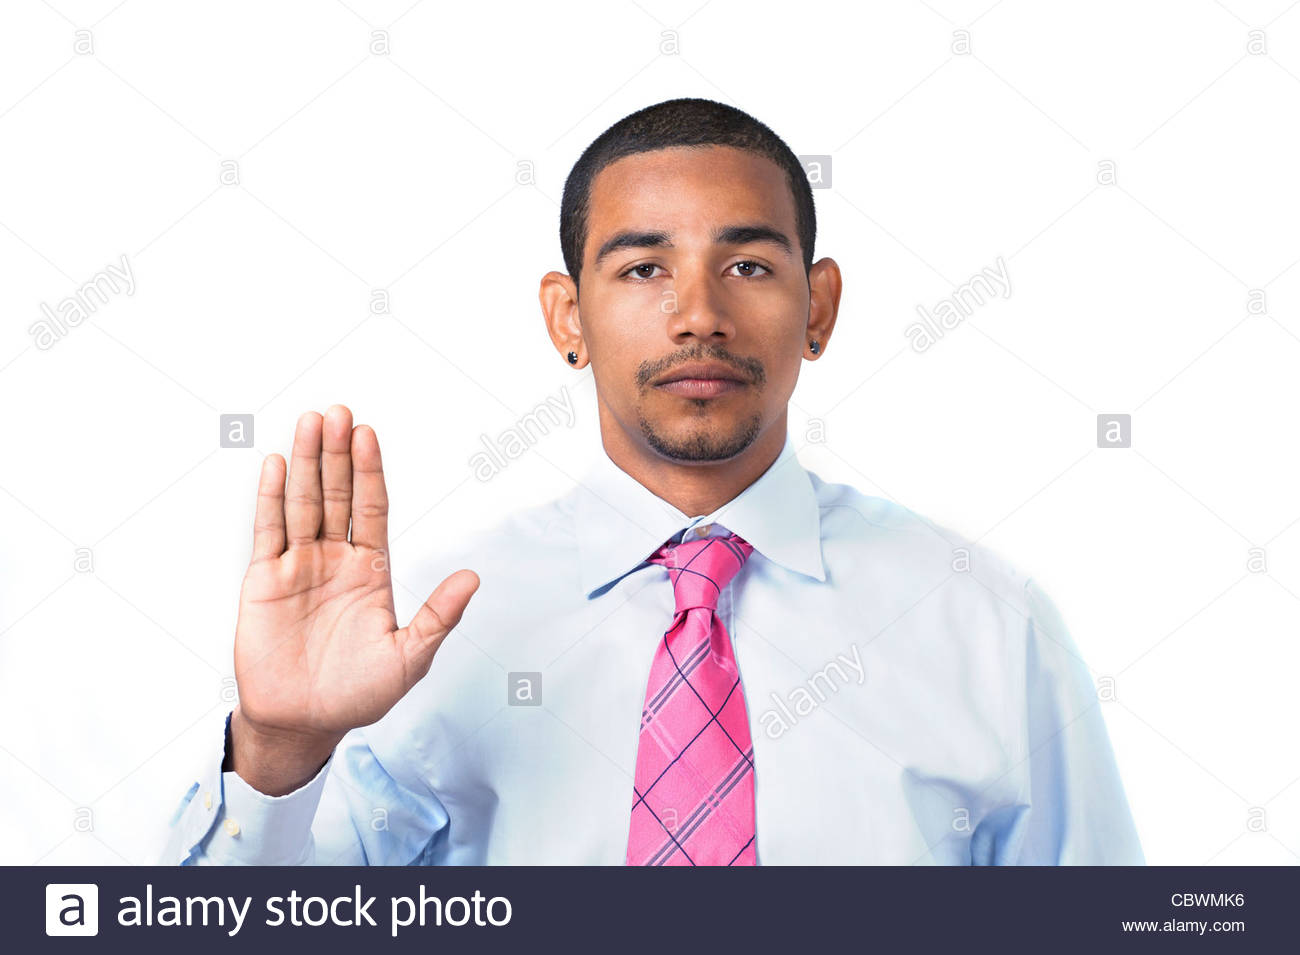 Hispanic man taking oath or pledge - Stock Image